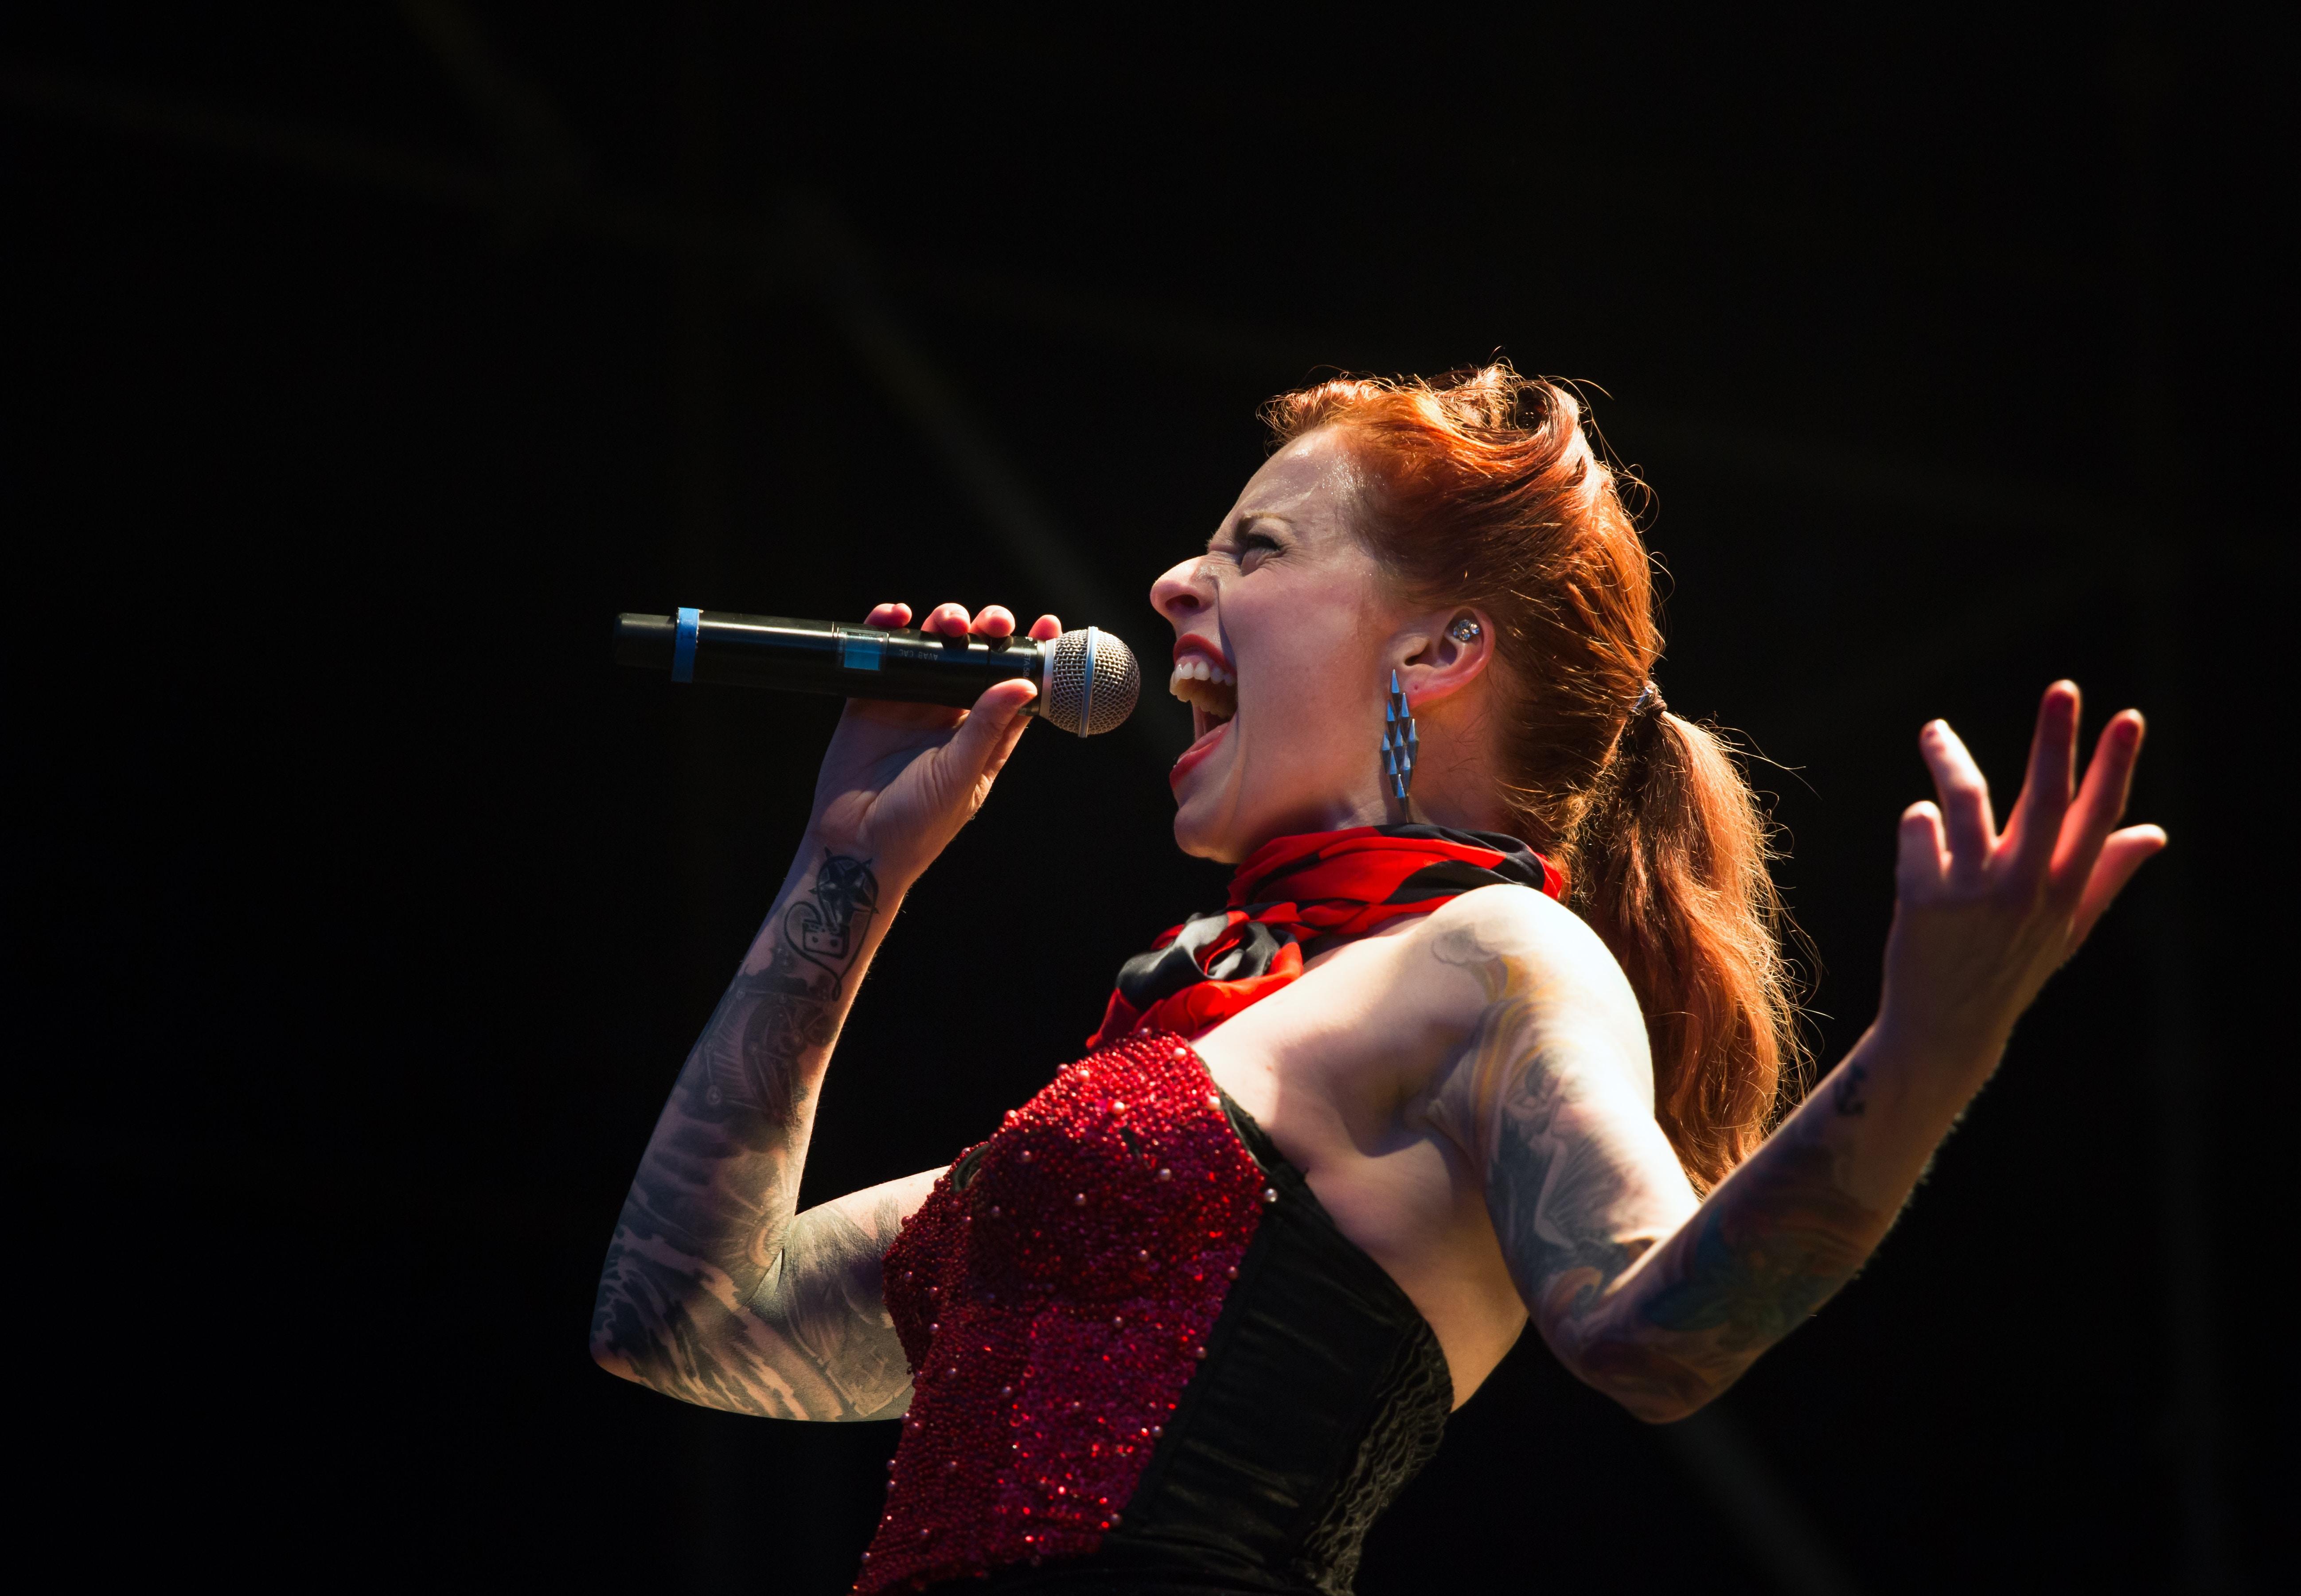 woman singing on wireless microphone